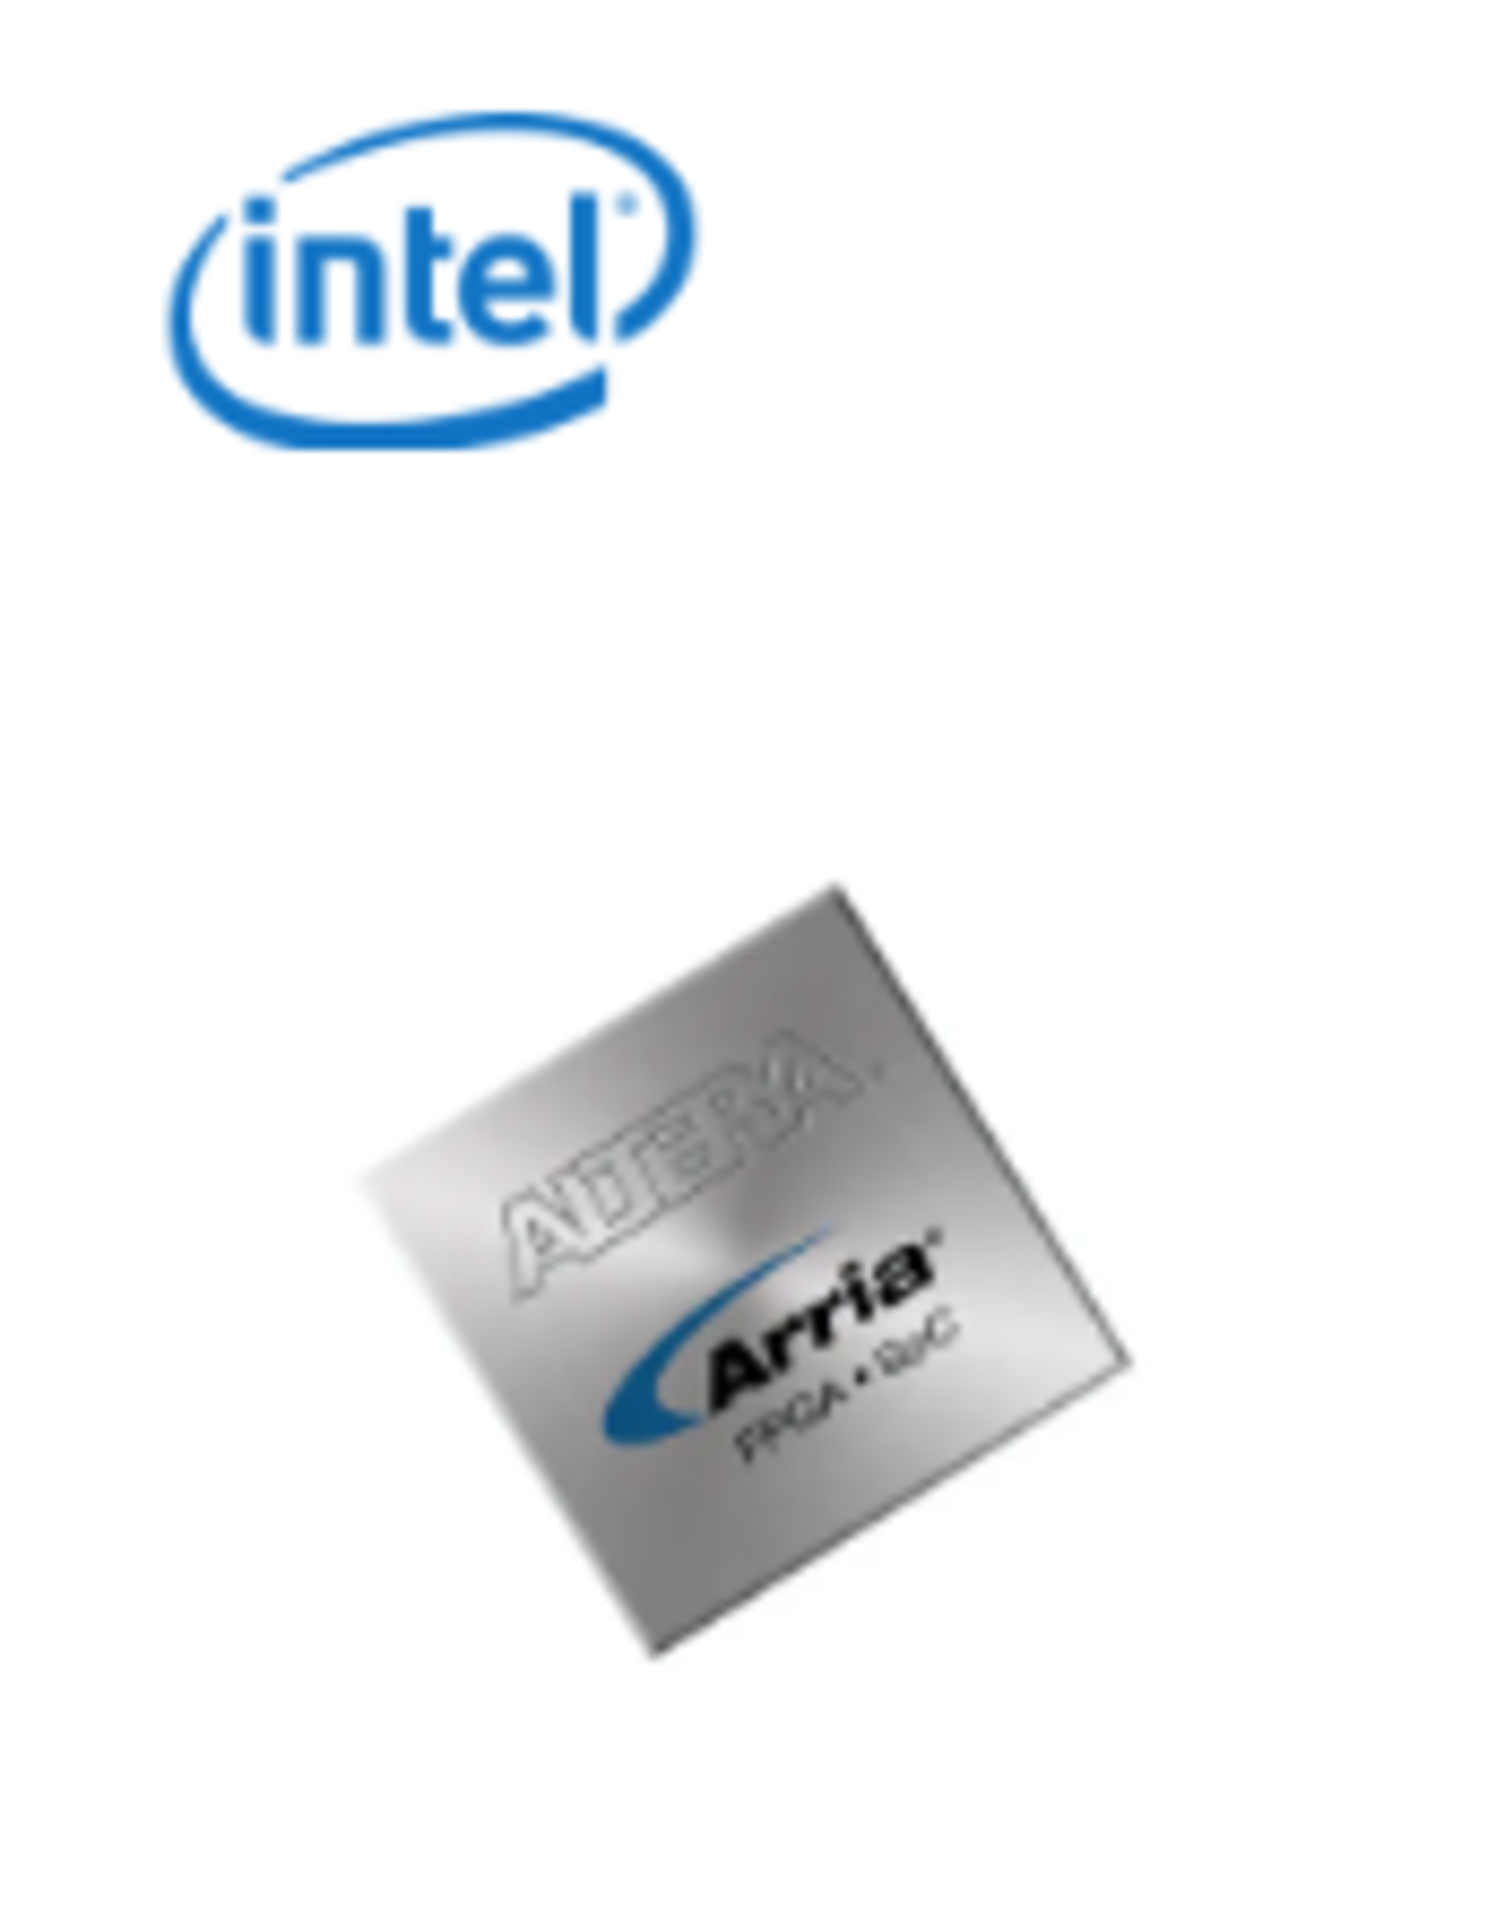 Intel 10AX027H3F34I2SG Field Programmable Gate Arrays, QTY 3, FPGA Arria 10 GX Family, 270000 Cells,